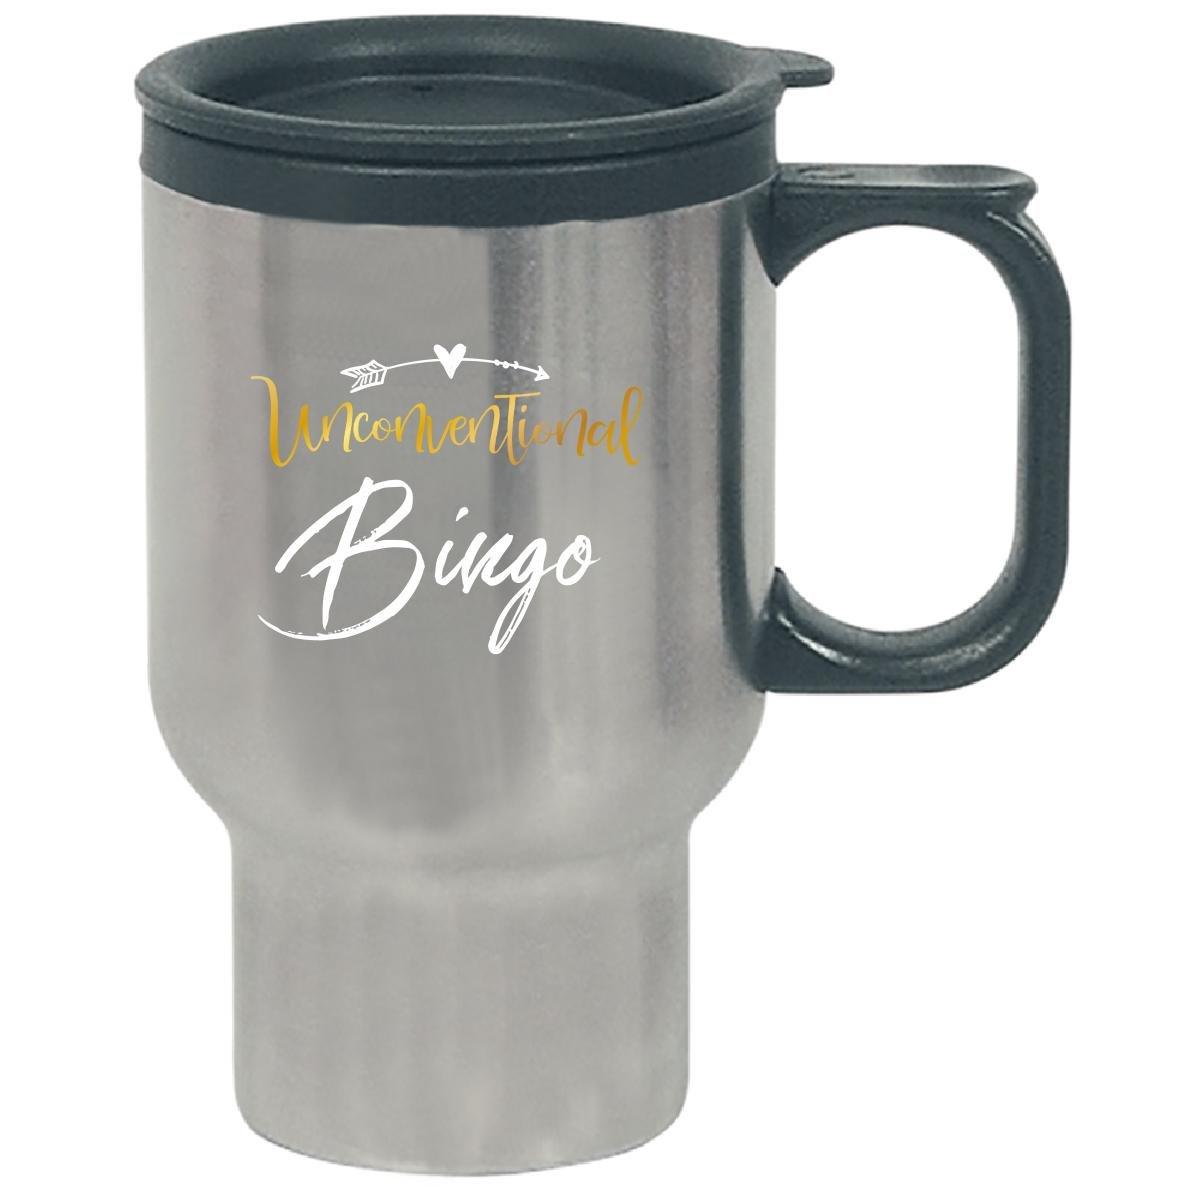 Unconventional Bingo Name Gift Mothers Day Grandma - Travel Mug